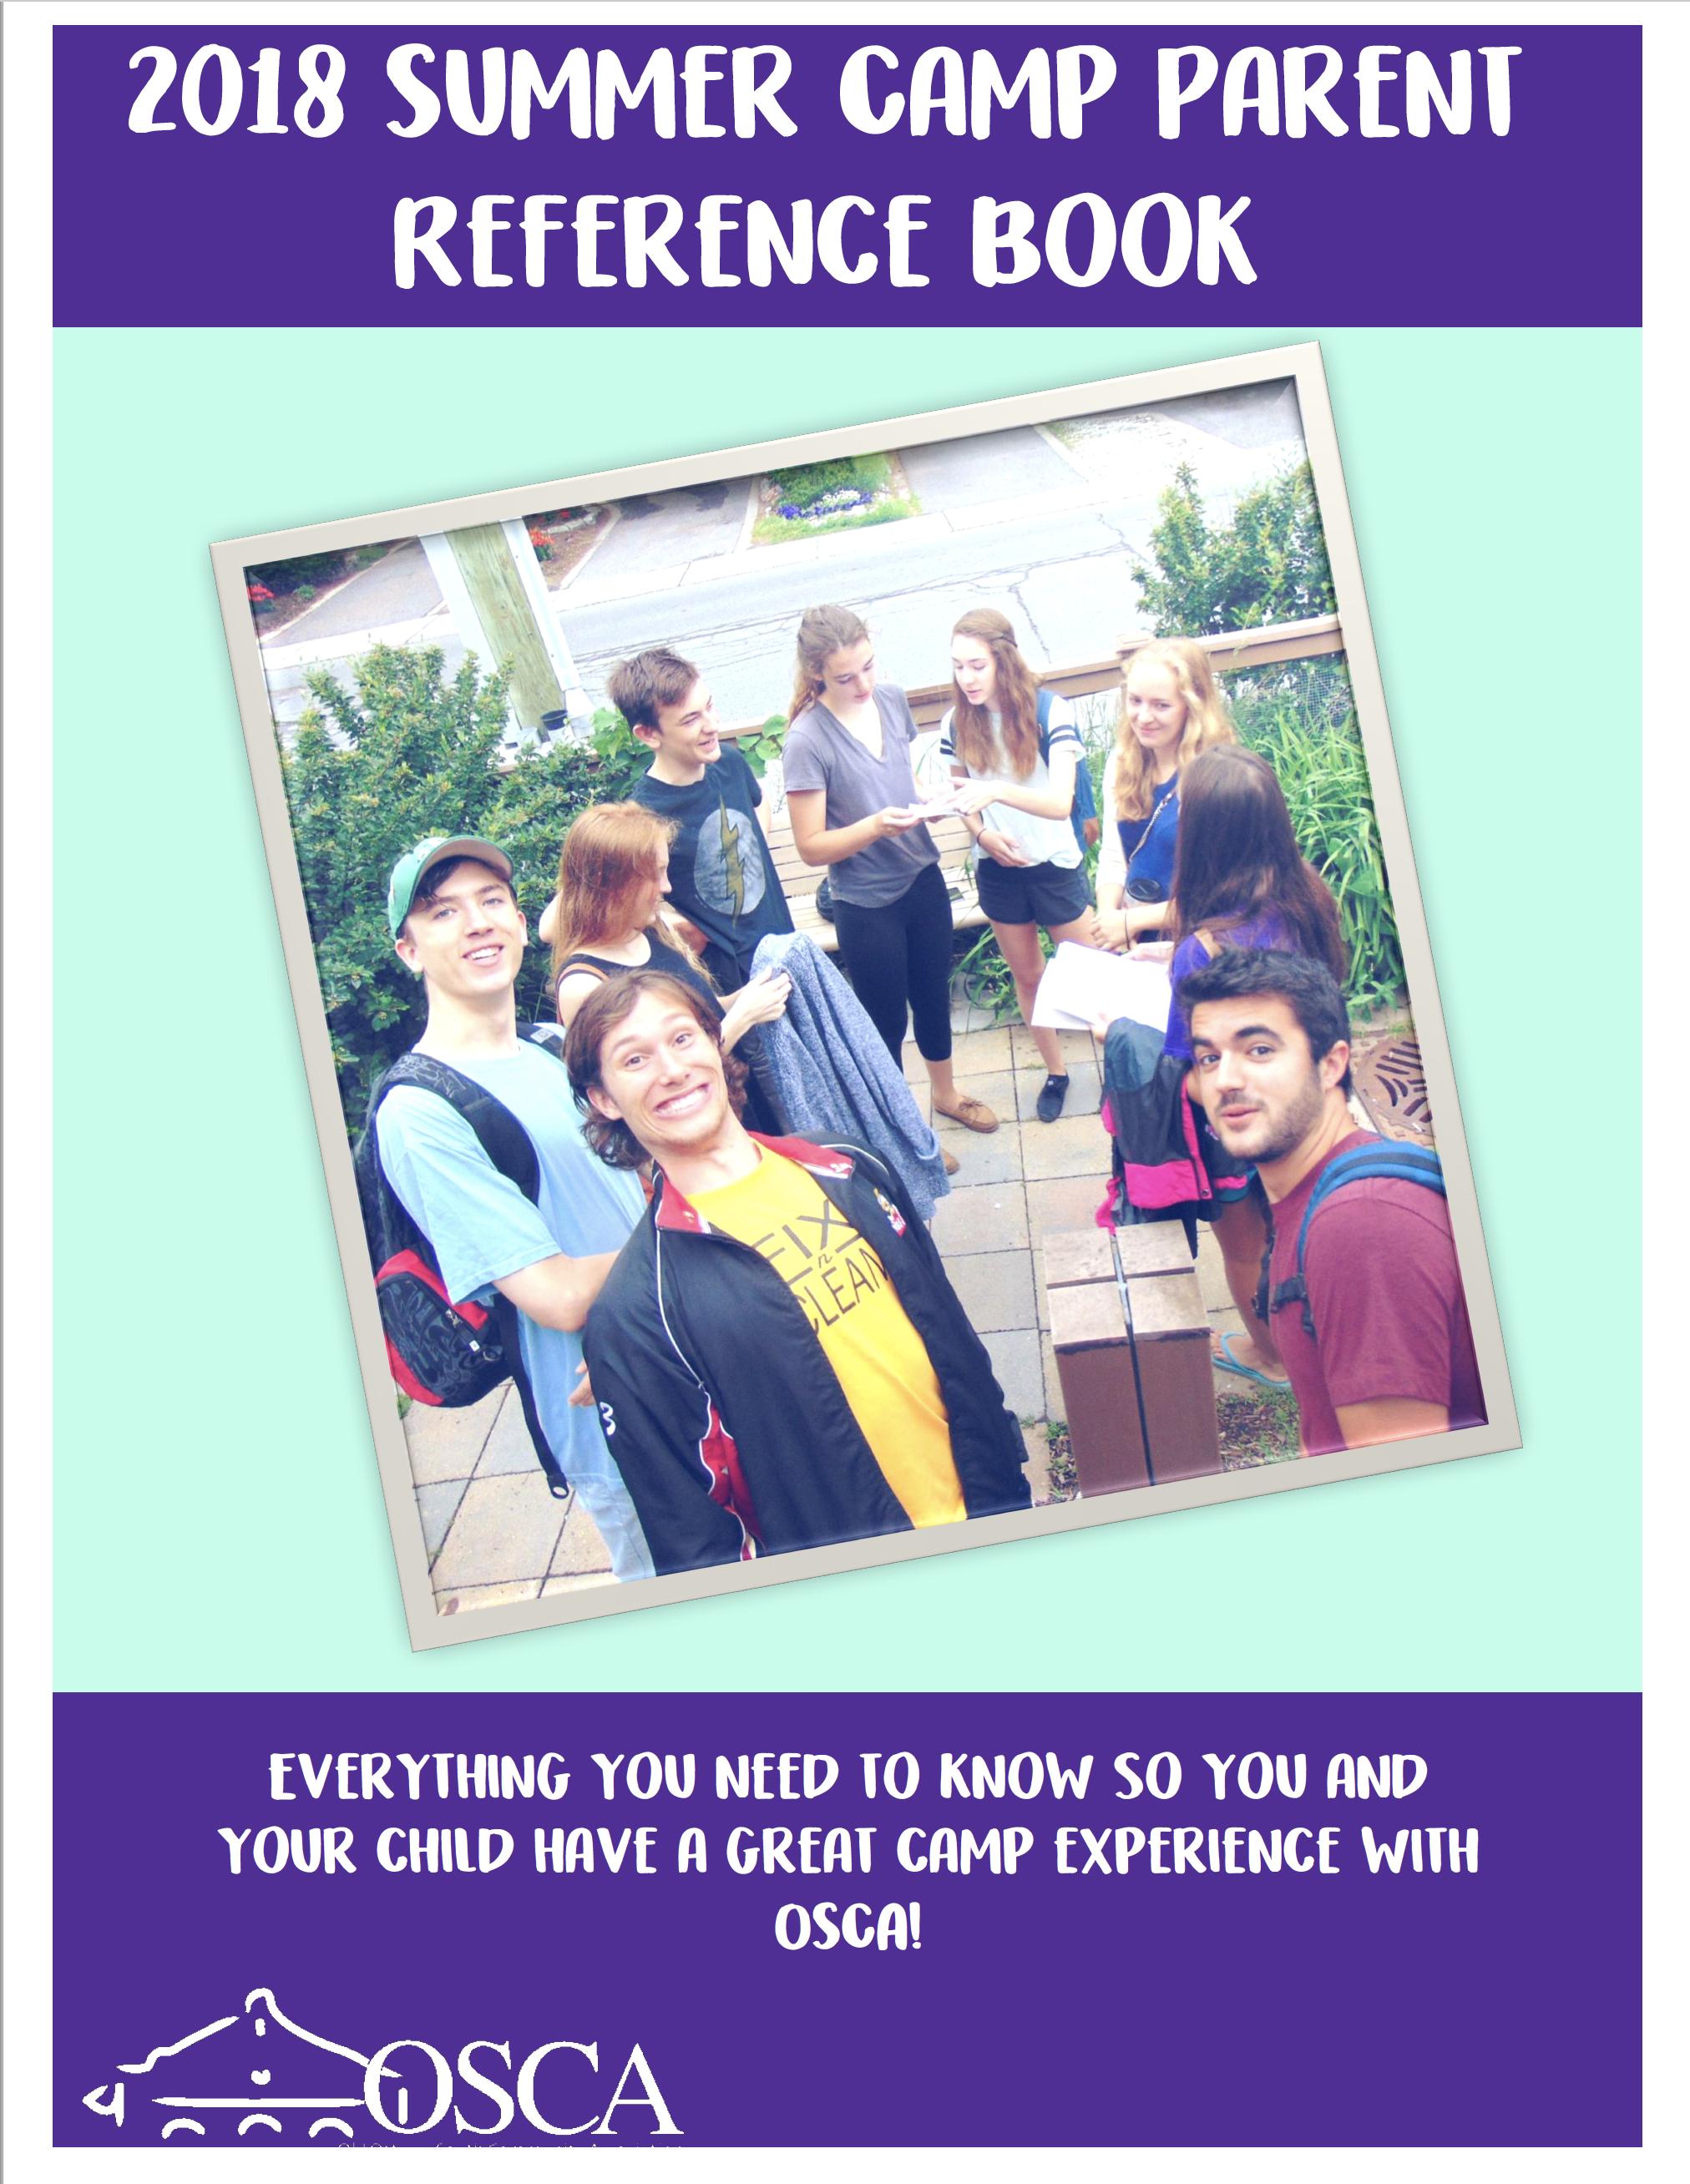 Summer Camp Parent Reference Booklet